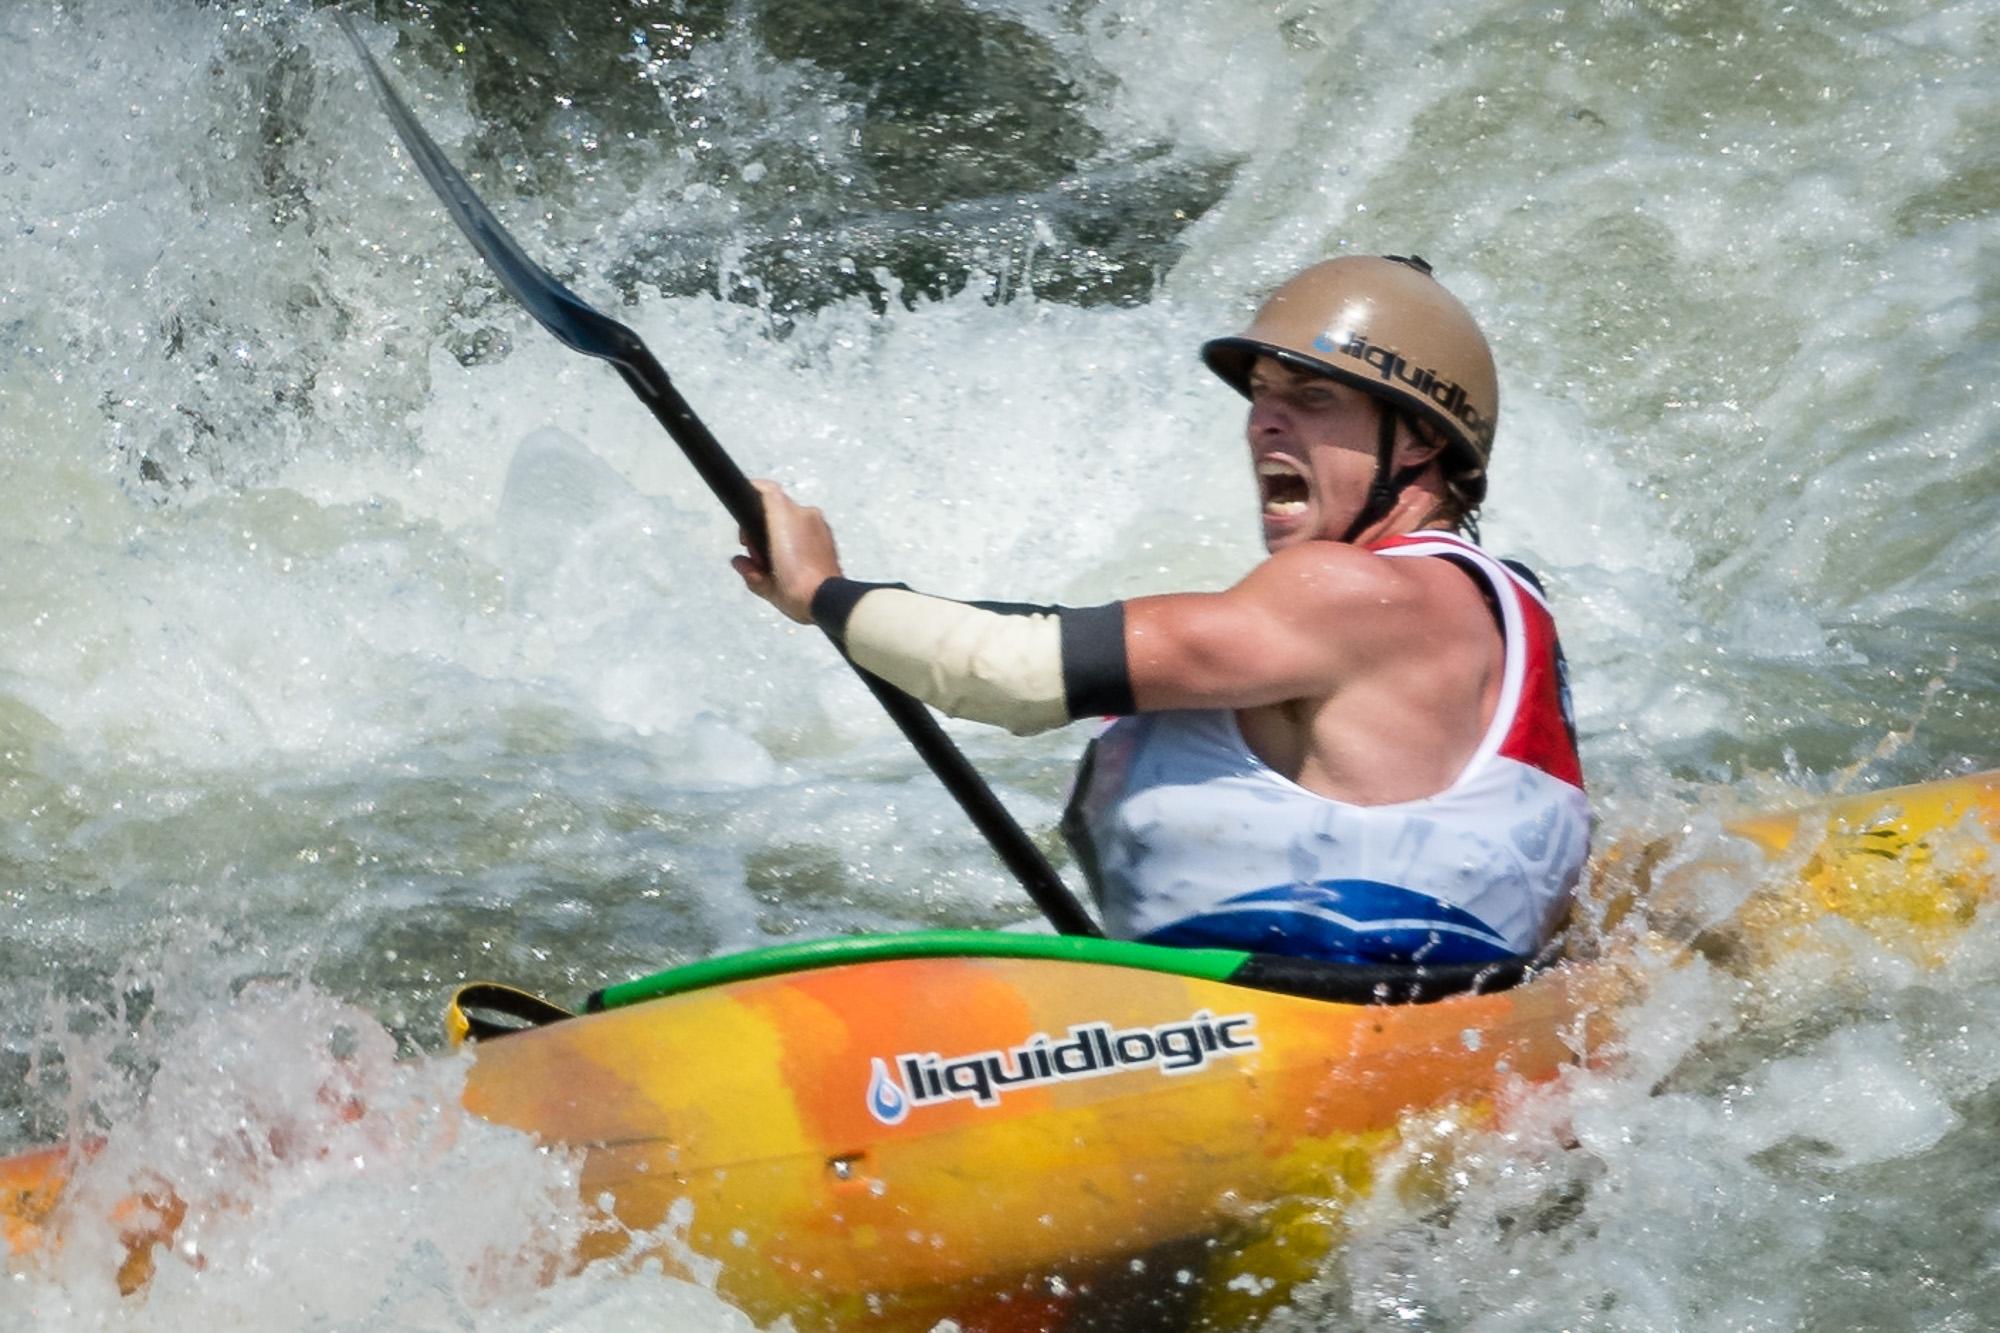 Pat Keller Enters the S-Turn at Great Falls